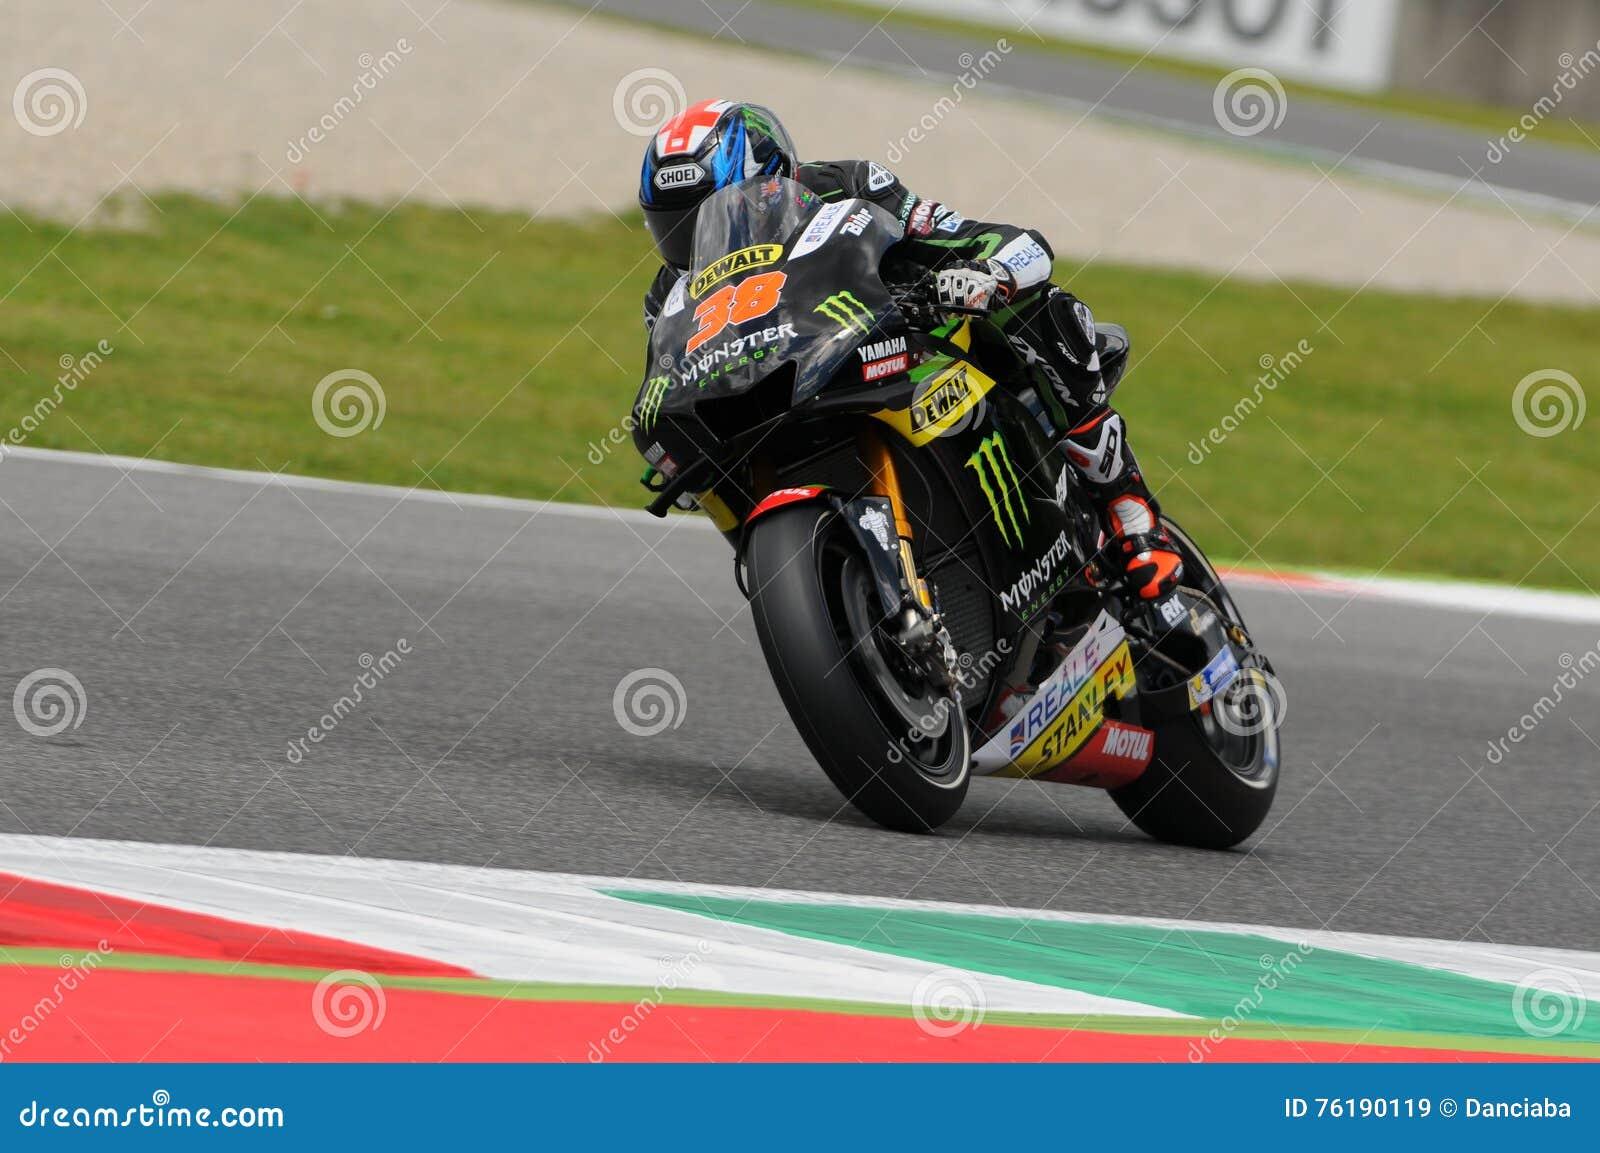 Circuit Italia Motogp : Mugello italy may italian yamaha rider valentino